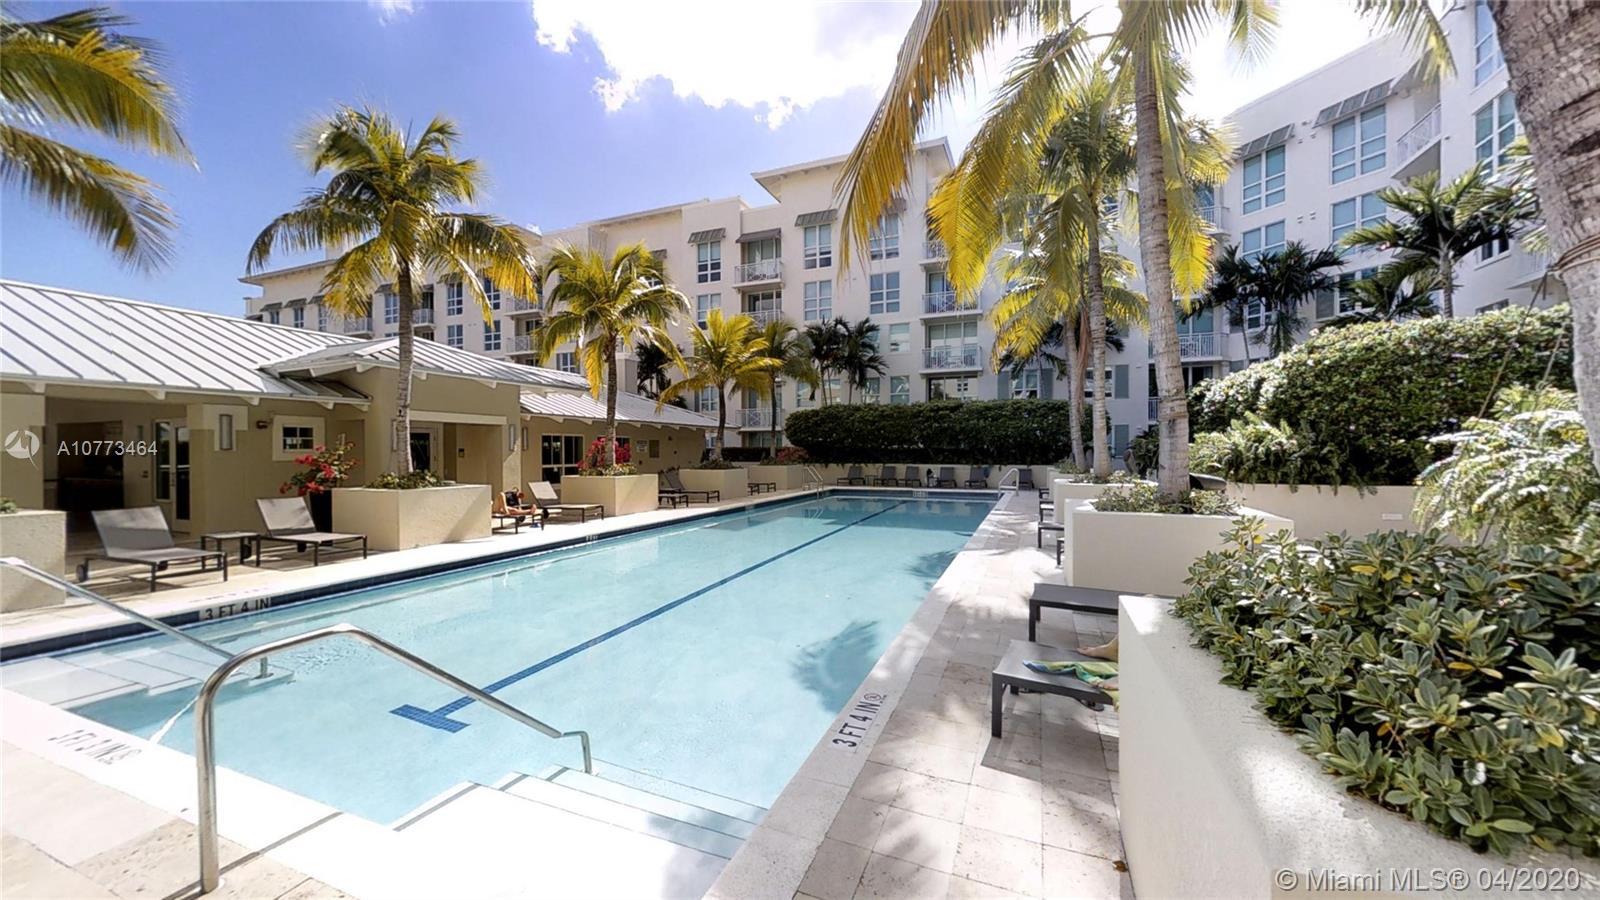 480 Hibiscus St 615, West Palm Beach, FL 33401